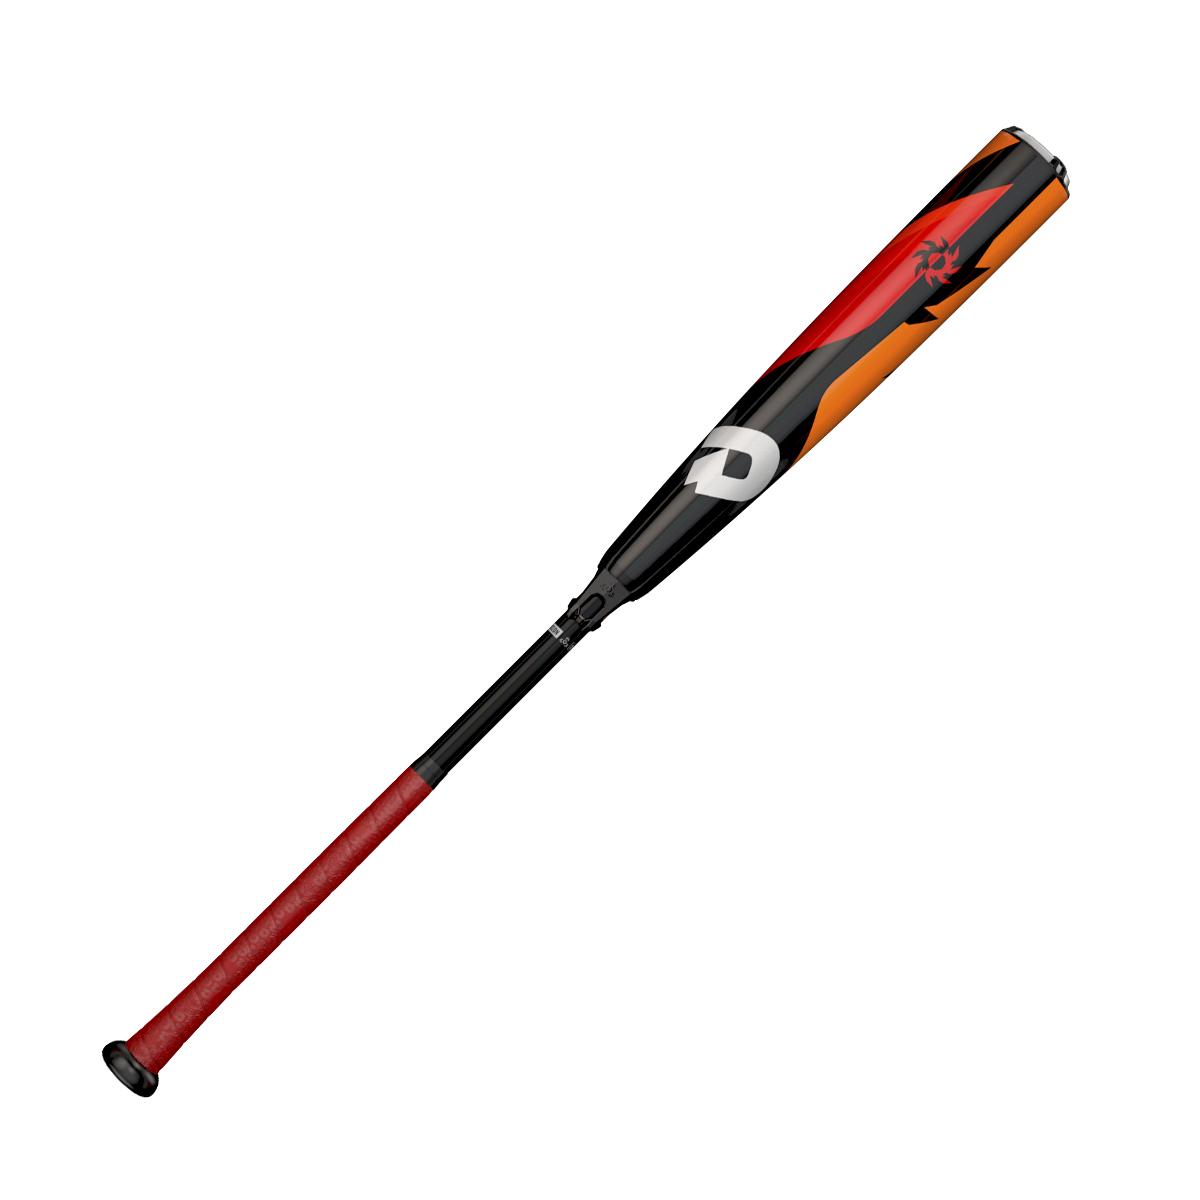 1200x1200 How To Choose A Baseball Bat Demarini